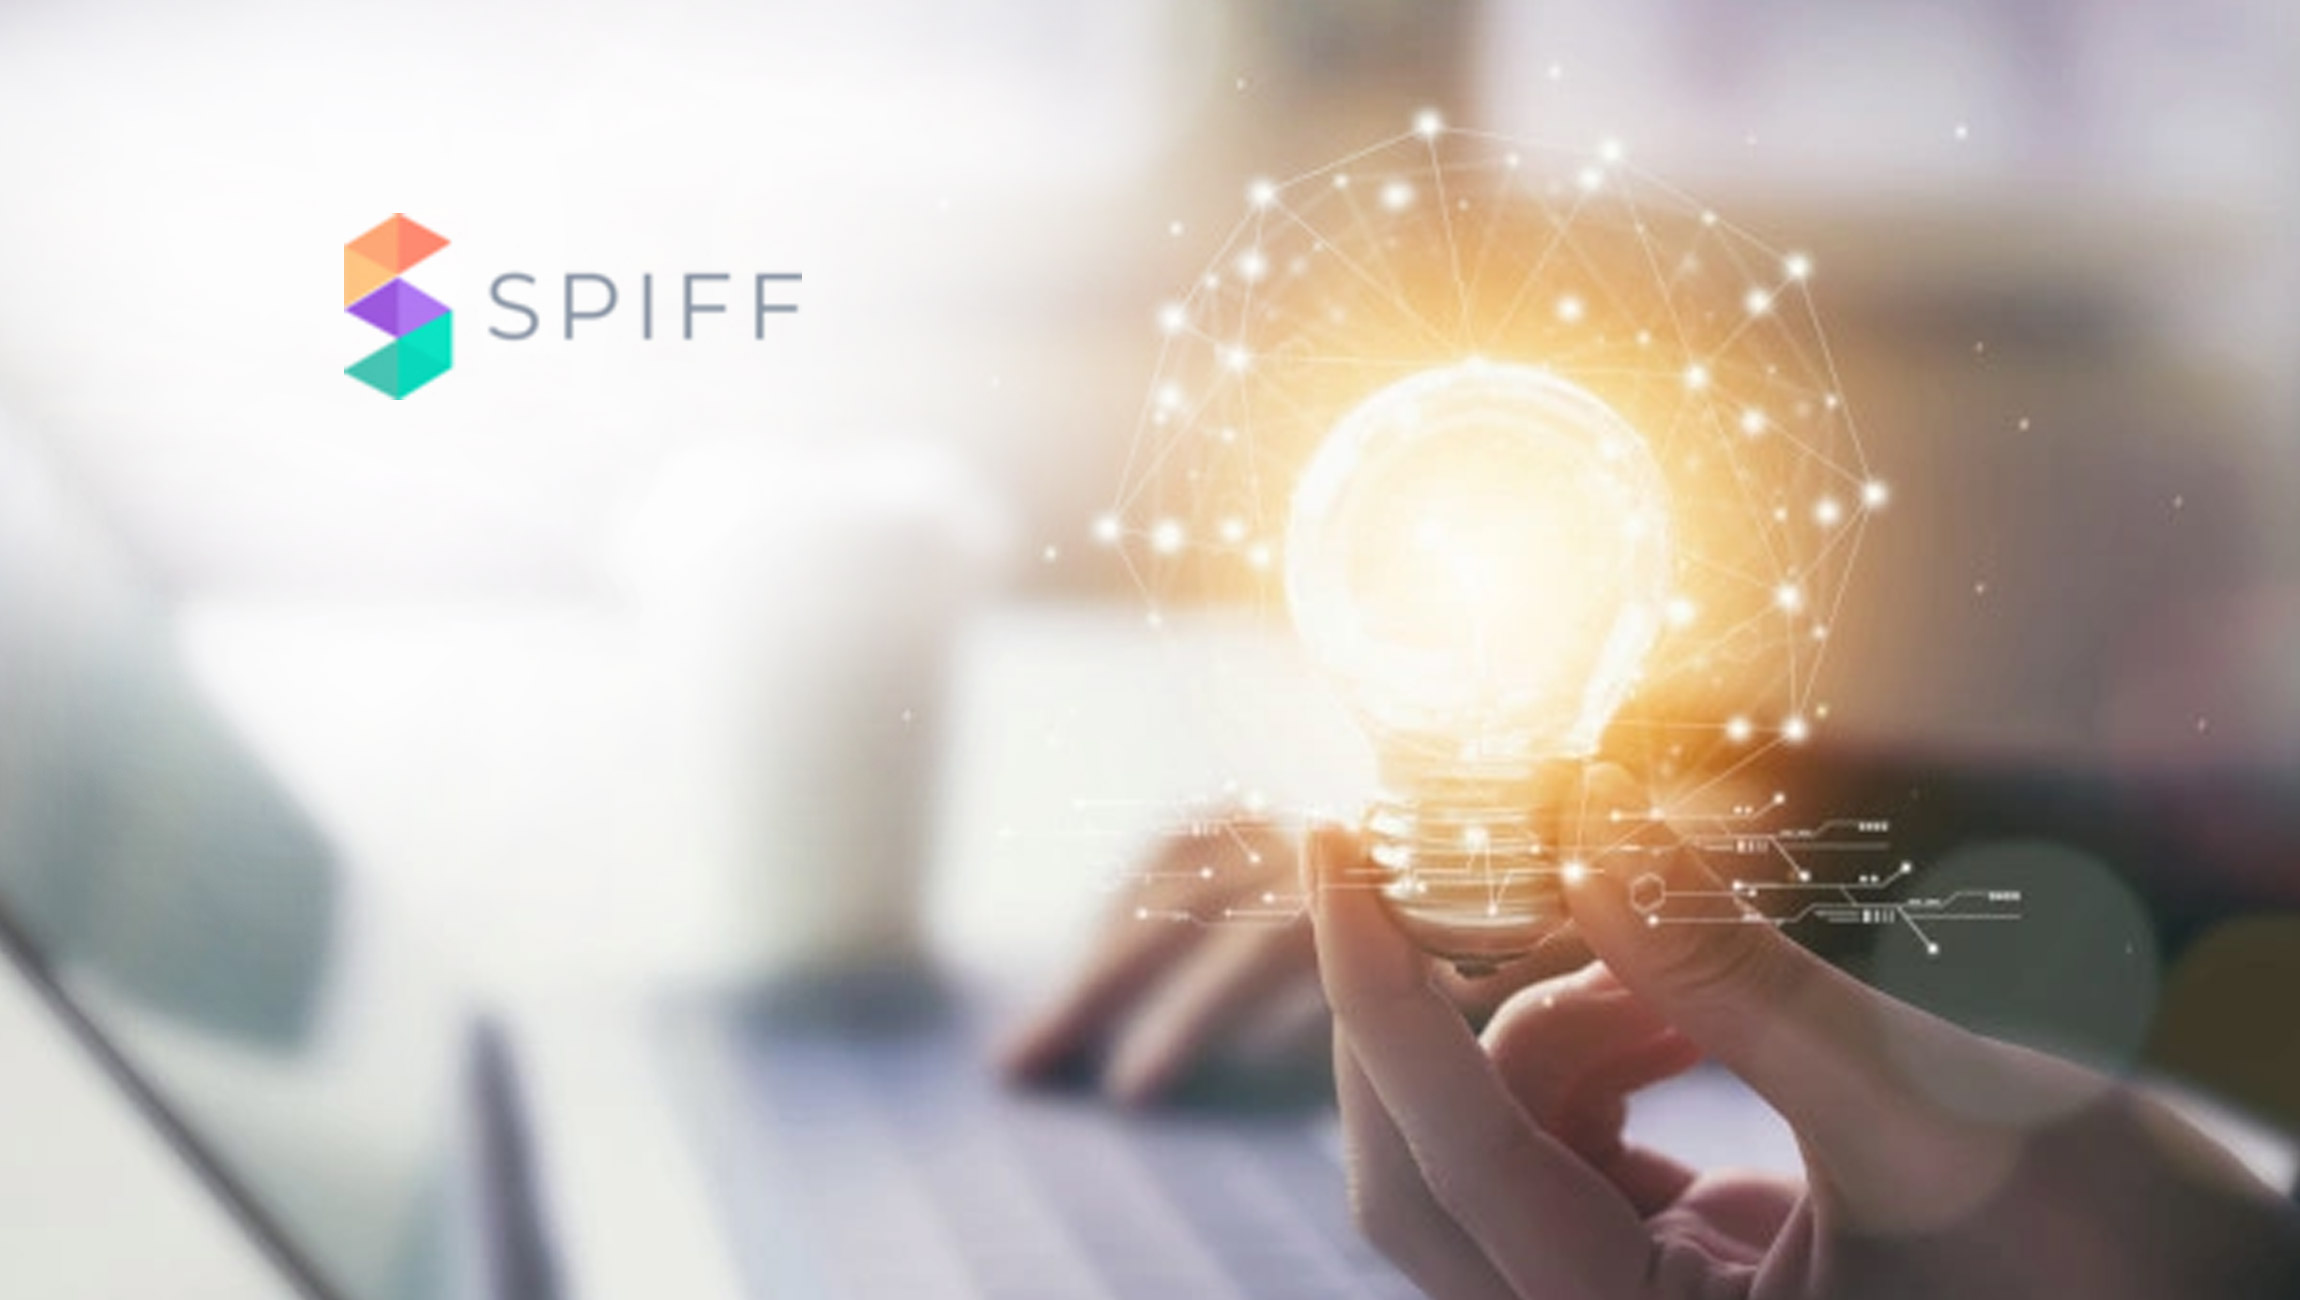 Spiff Launches on Salesforce AppExchange, The World's Leading Enterprise Cloud Marketplace